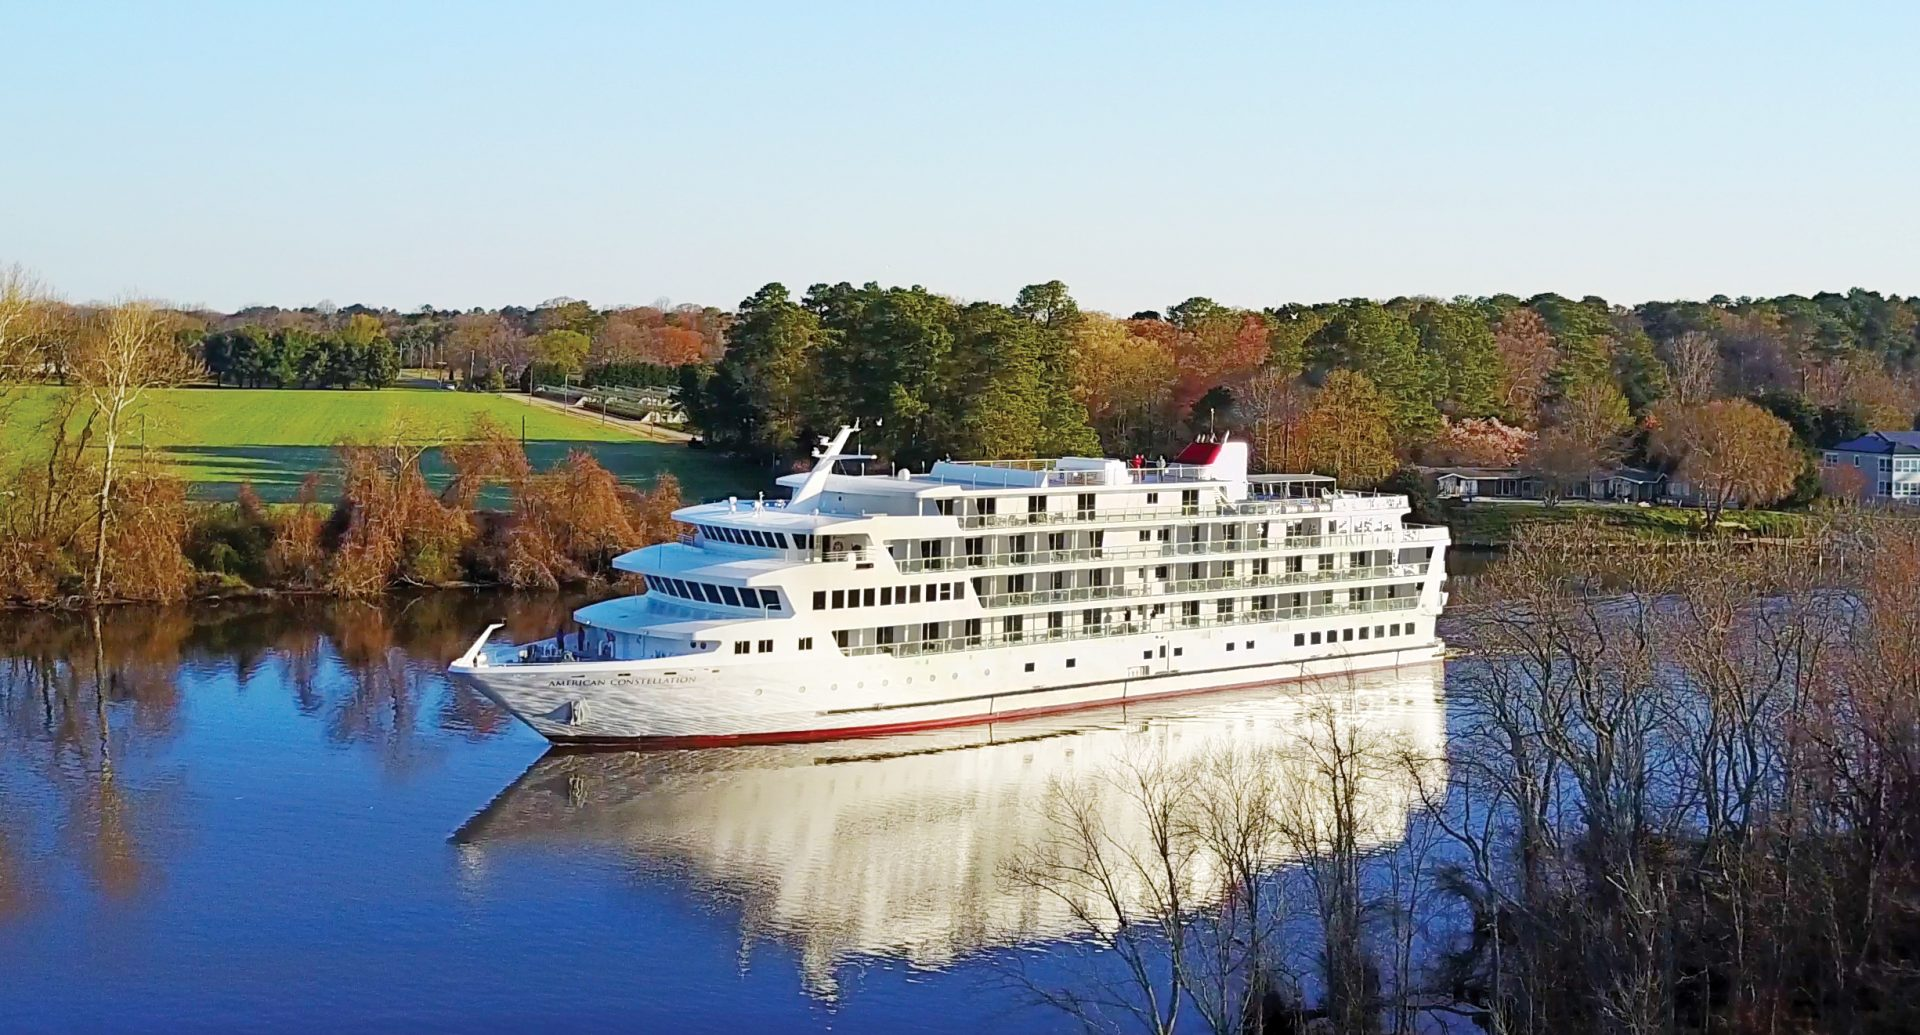 American Constellation Usa River Cruises